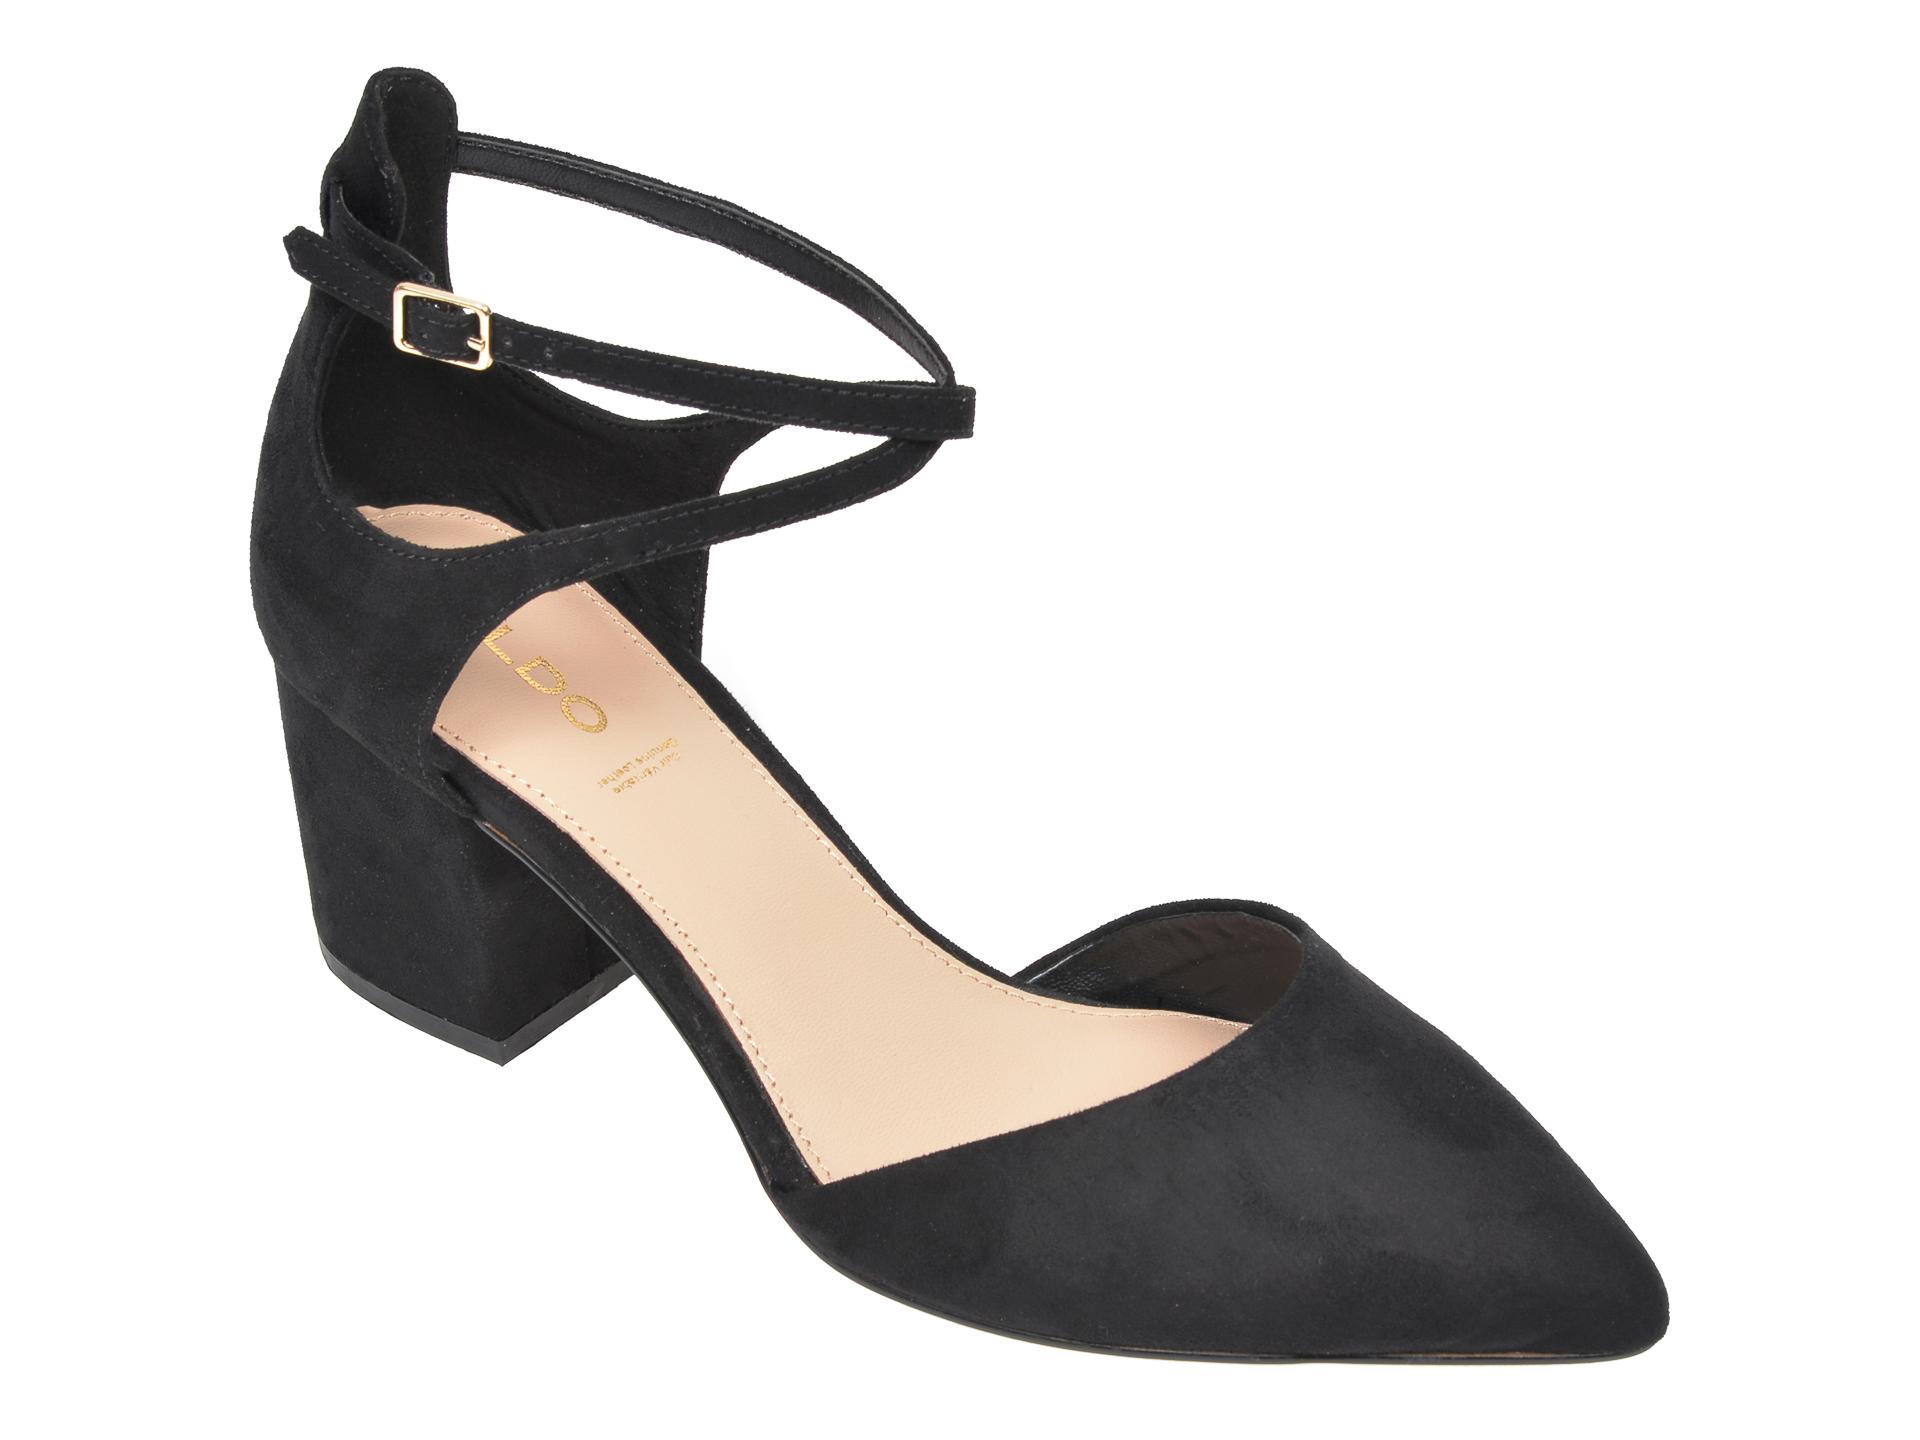 Pantofi ALDO negri, Brookshear001, din material textil